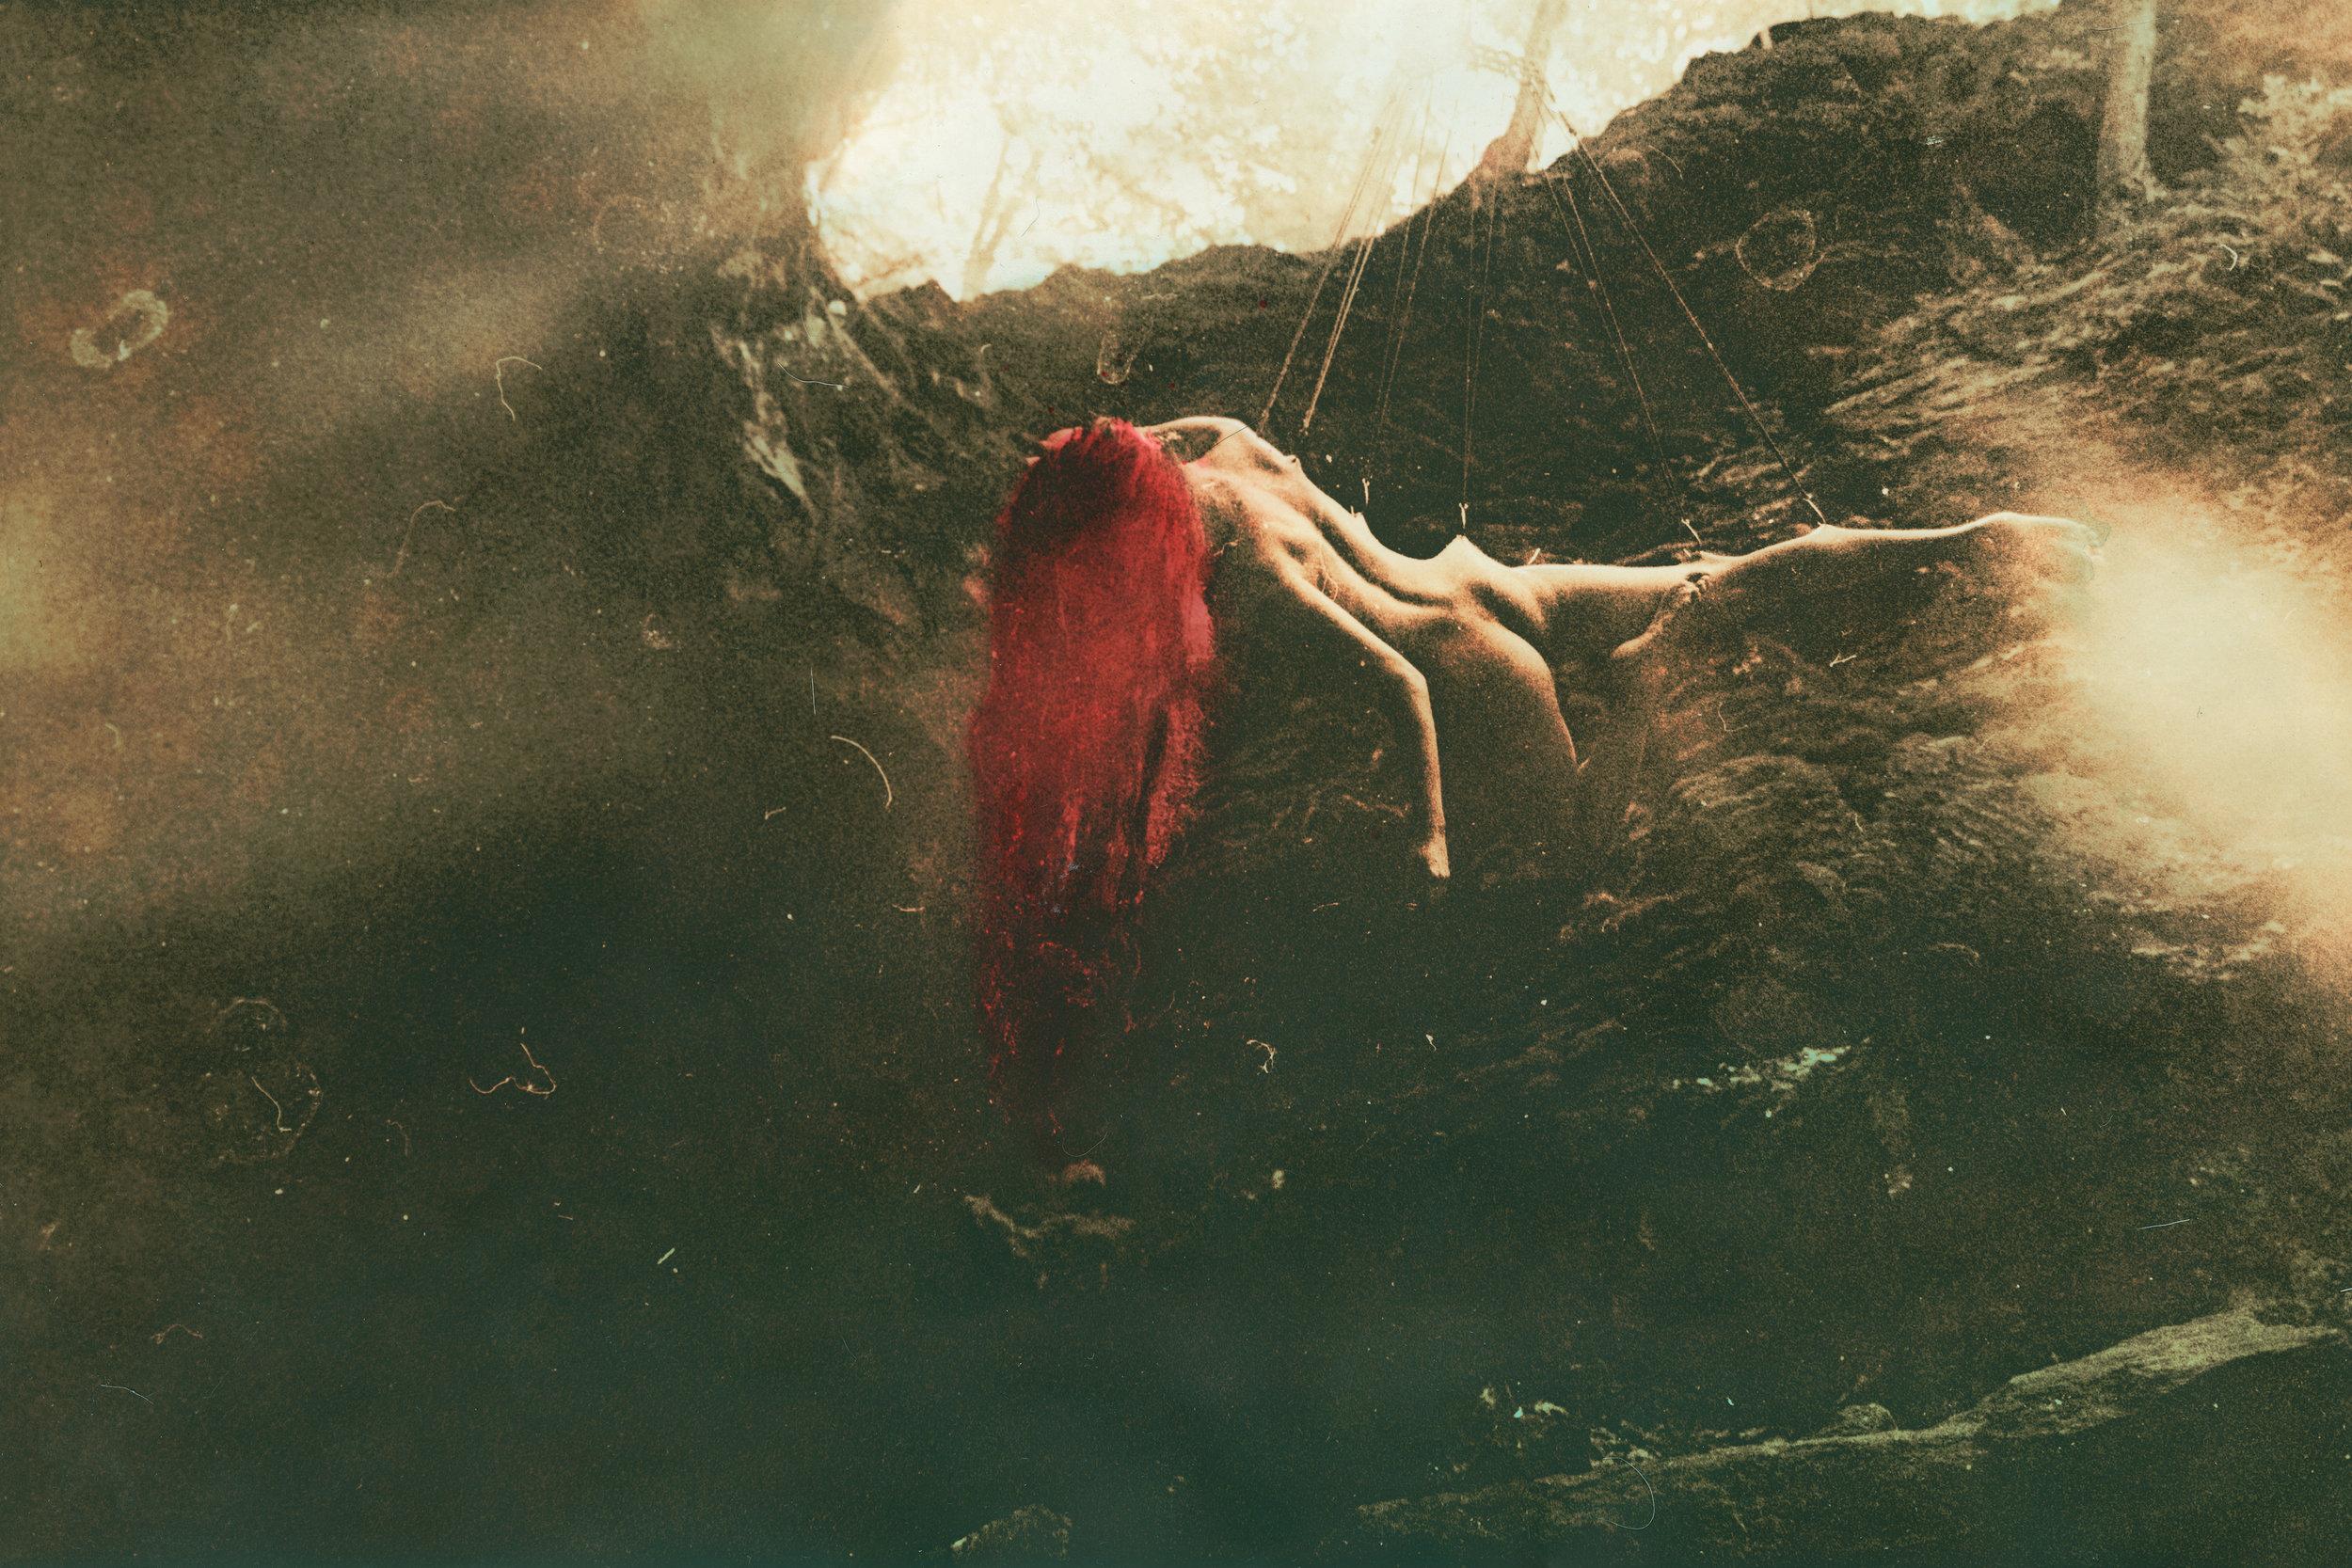 Prints on display at Skin: Bay - Living Entropy — Lilith